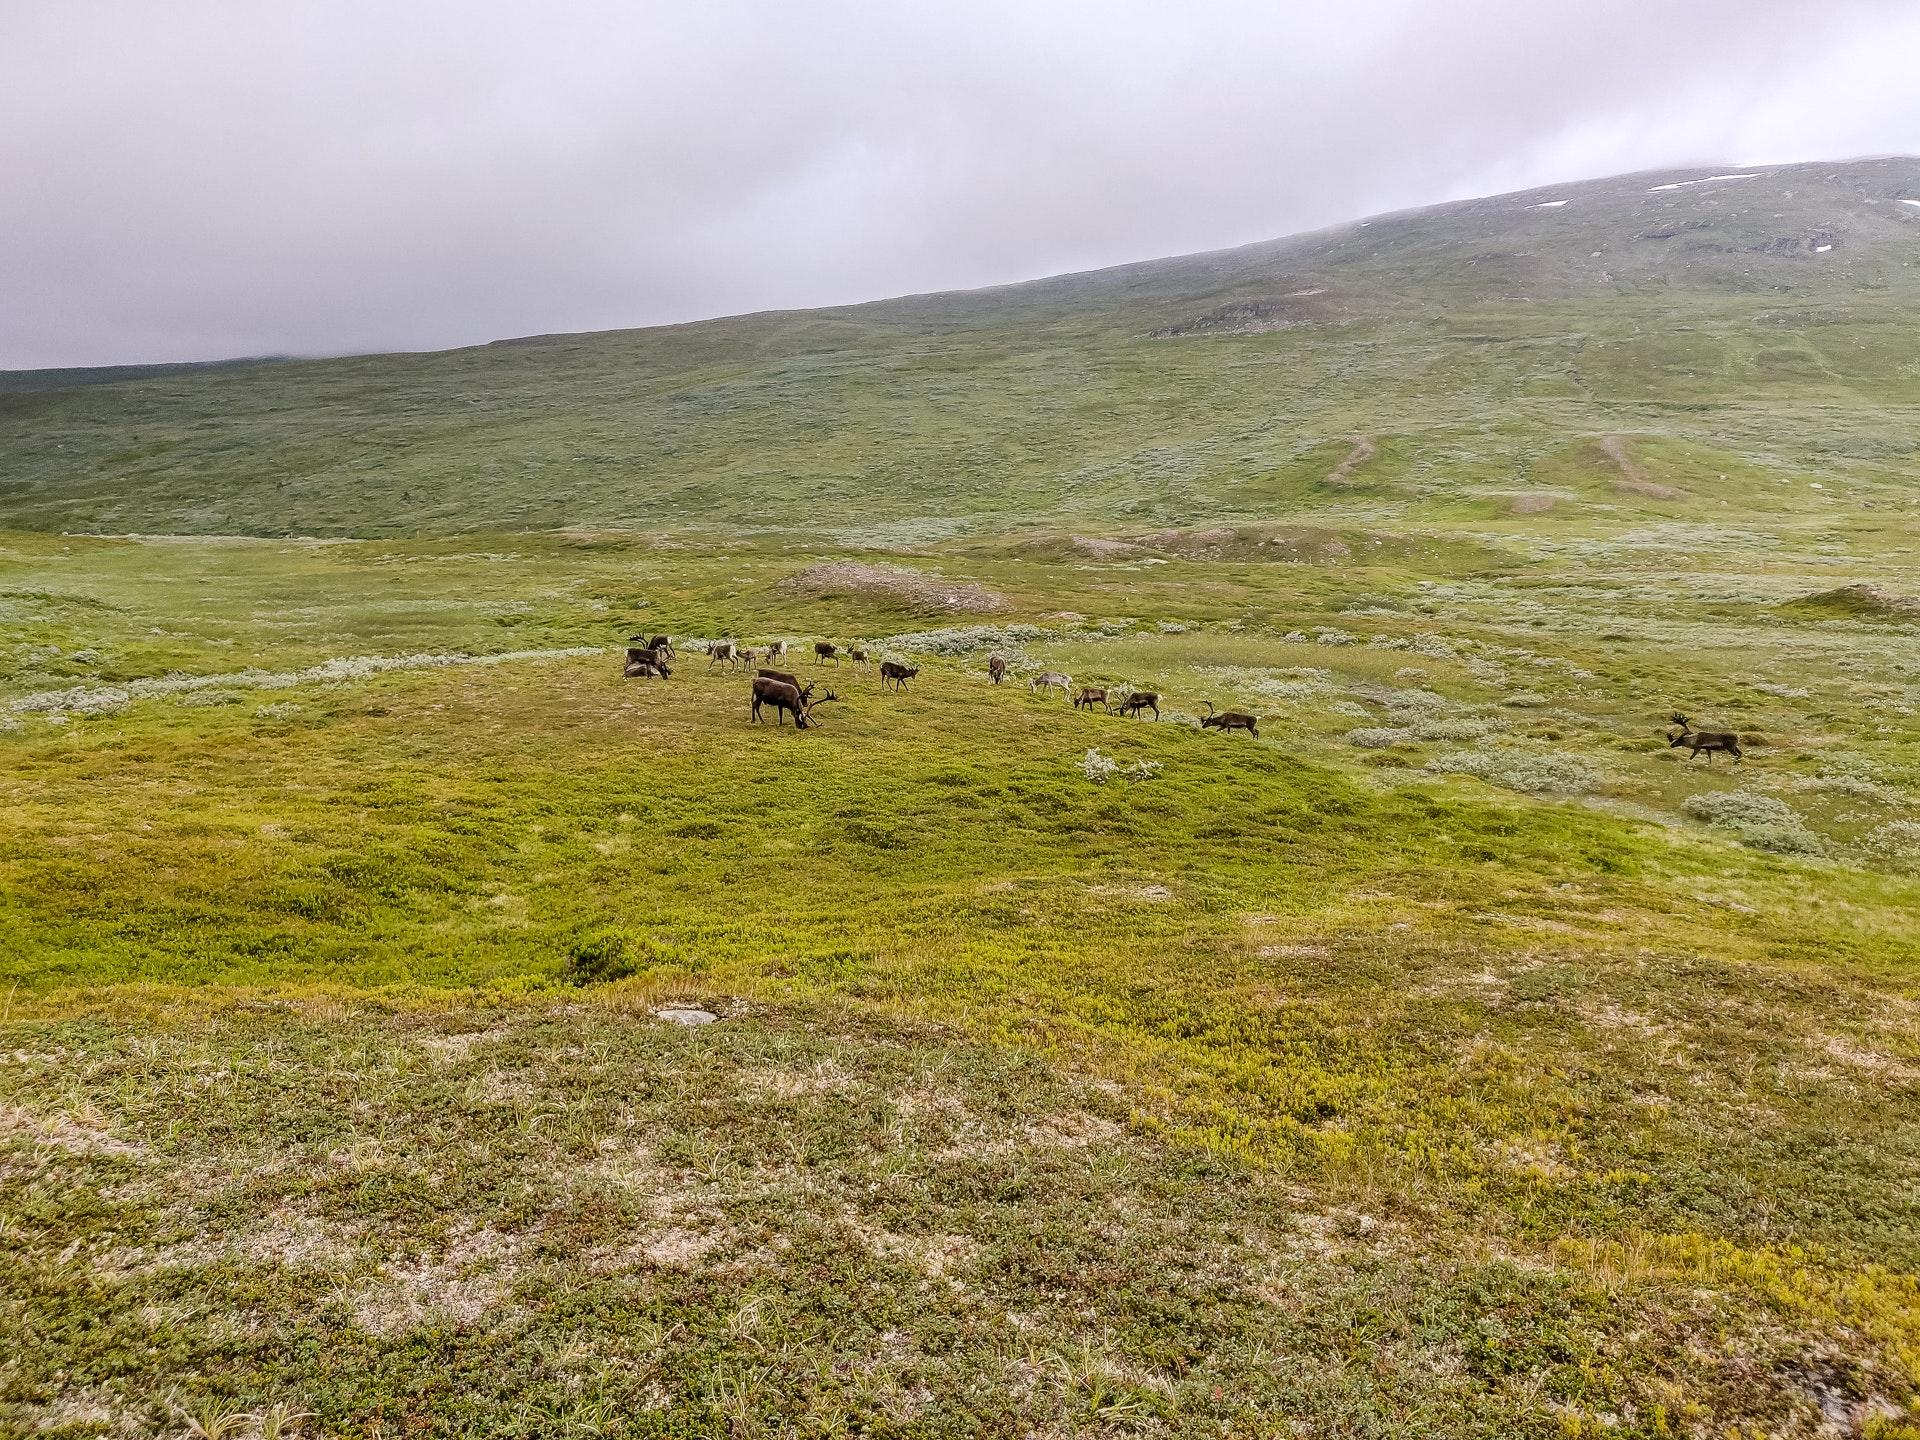 Herd of reindeer coming to say farewell